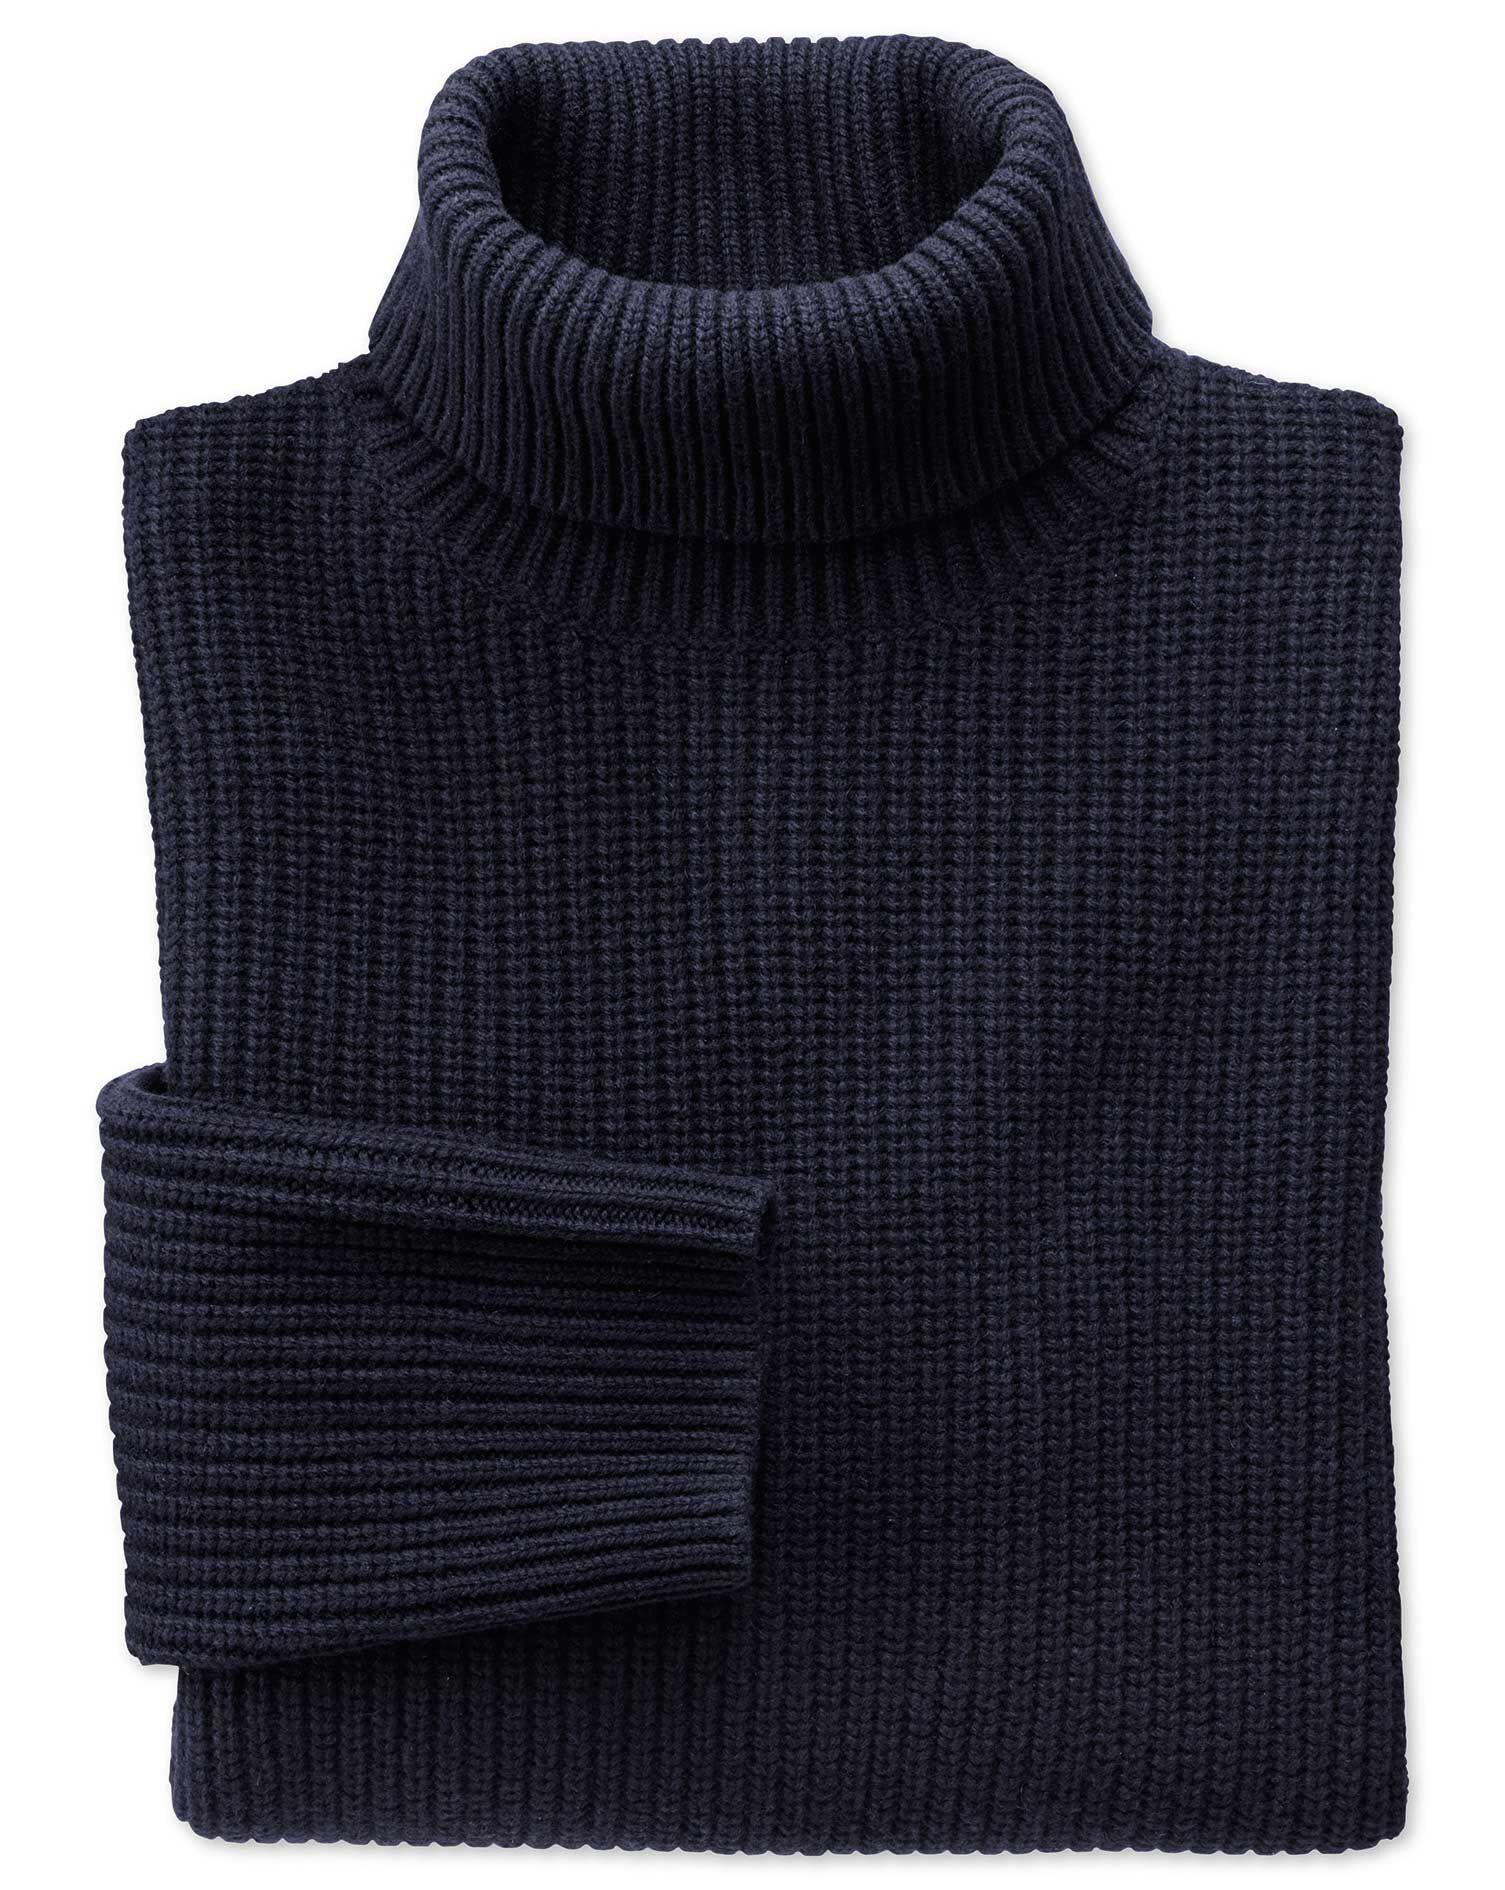 Navy Rib Roll Neck Wool Jumper Size XL by Charles Tyrwhitt